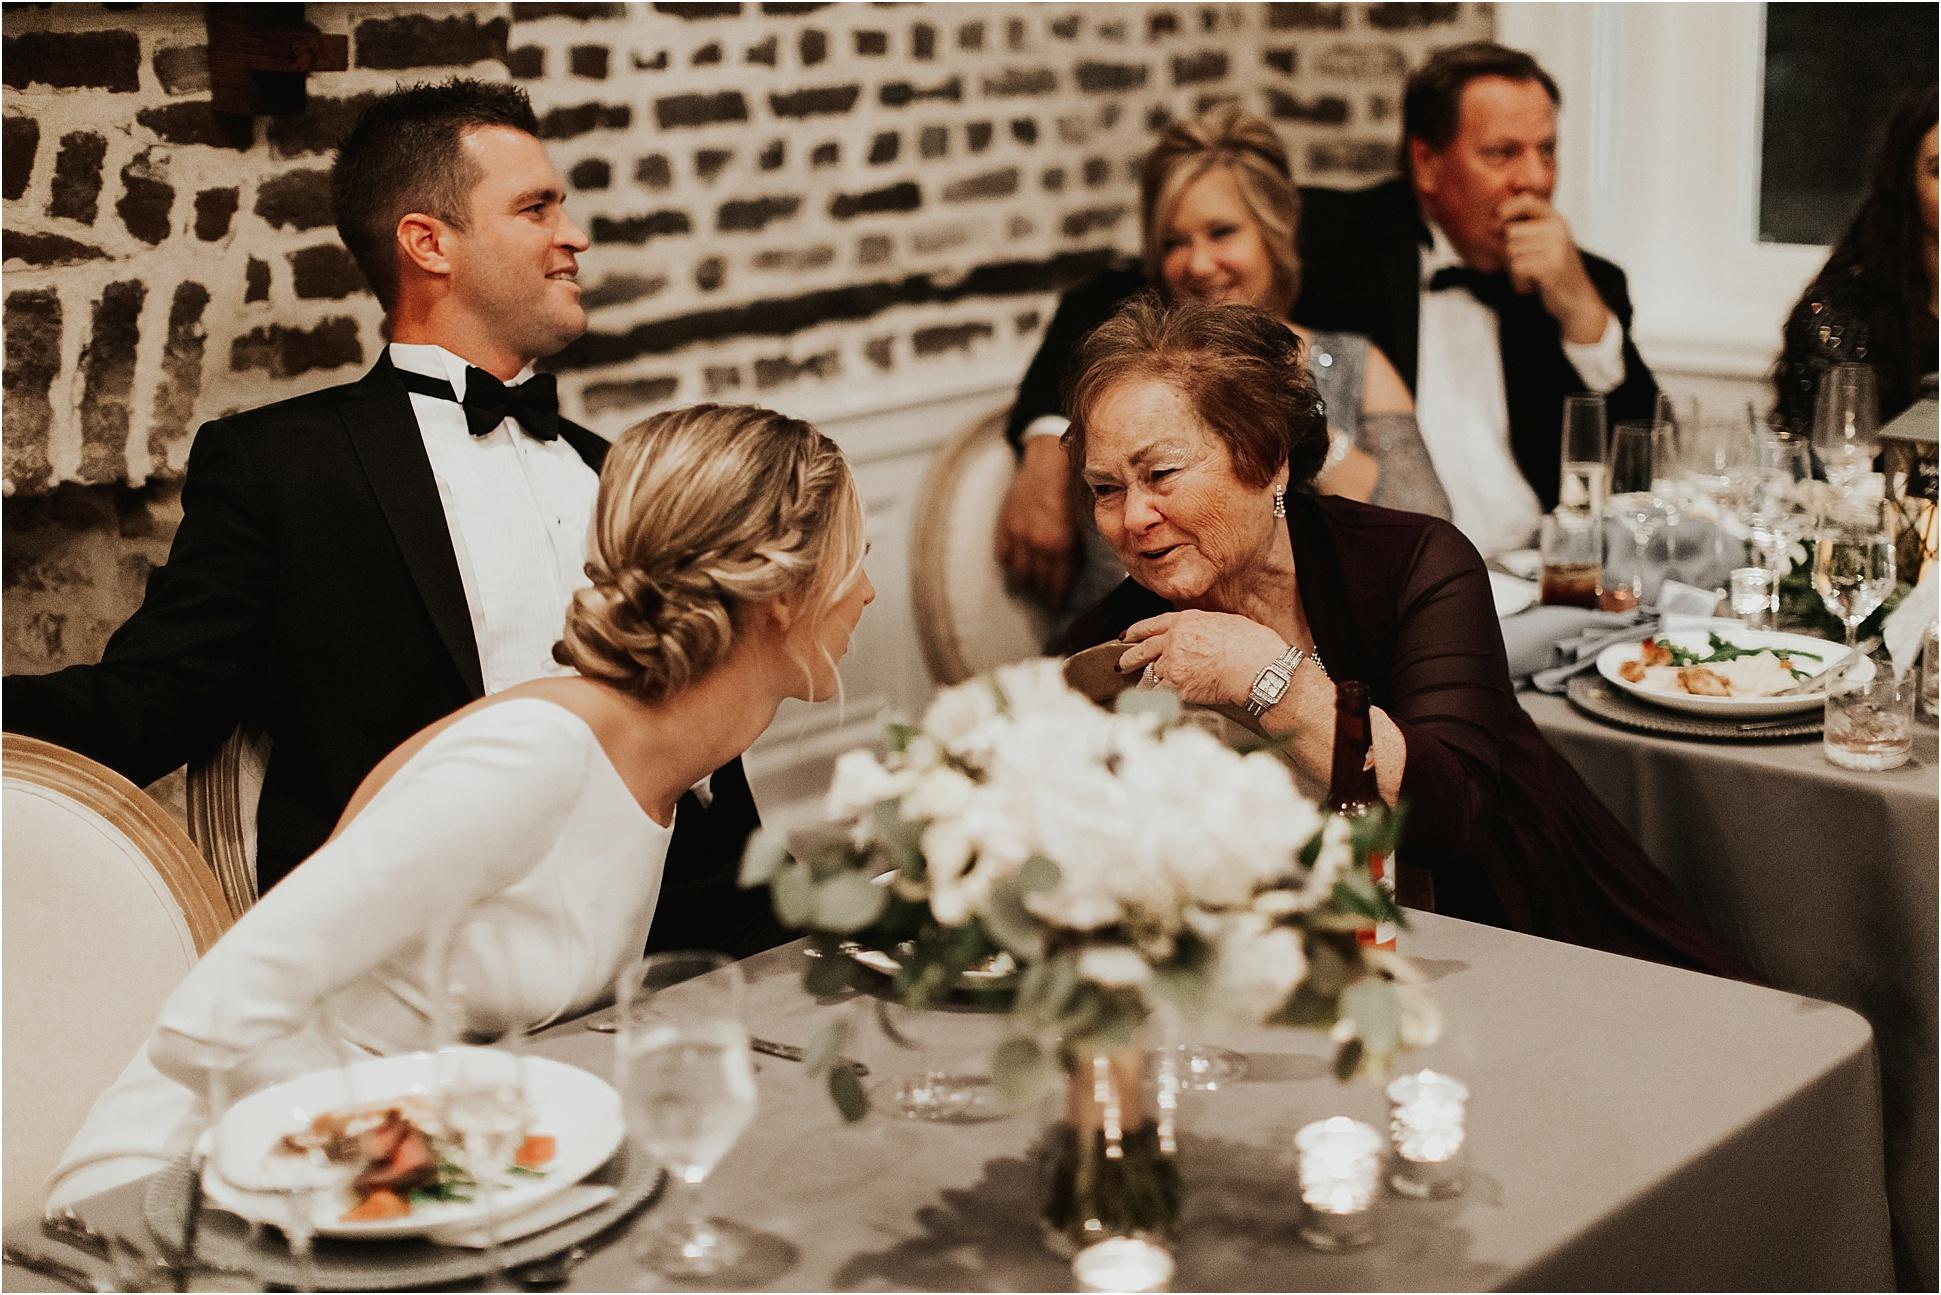 upstairs_midtown_intimate_charleston_wedding075.JPG